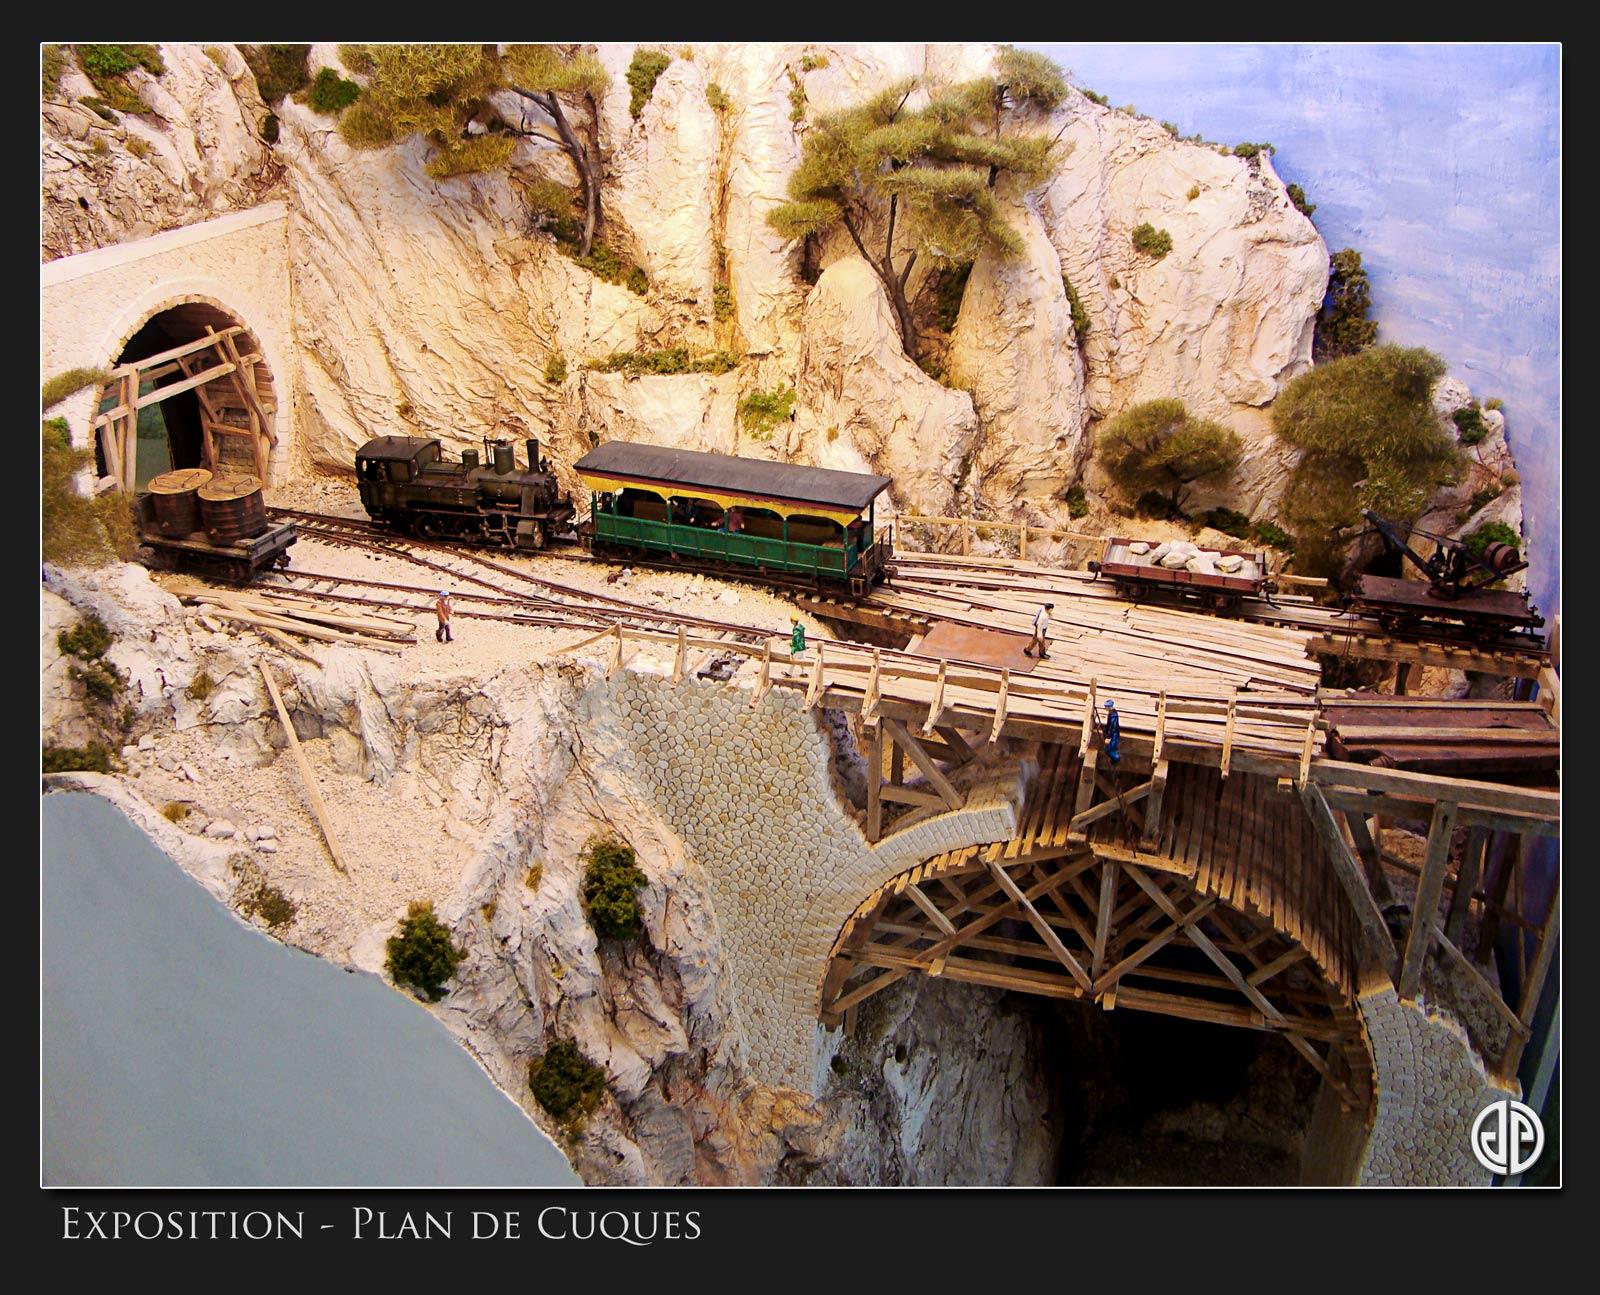 Expo-ferroviaire-Plan-de-Cuques-19